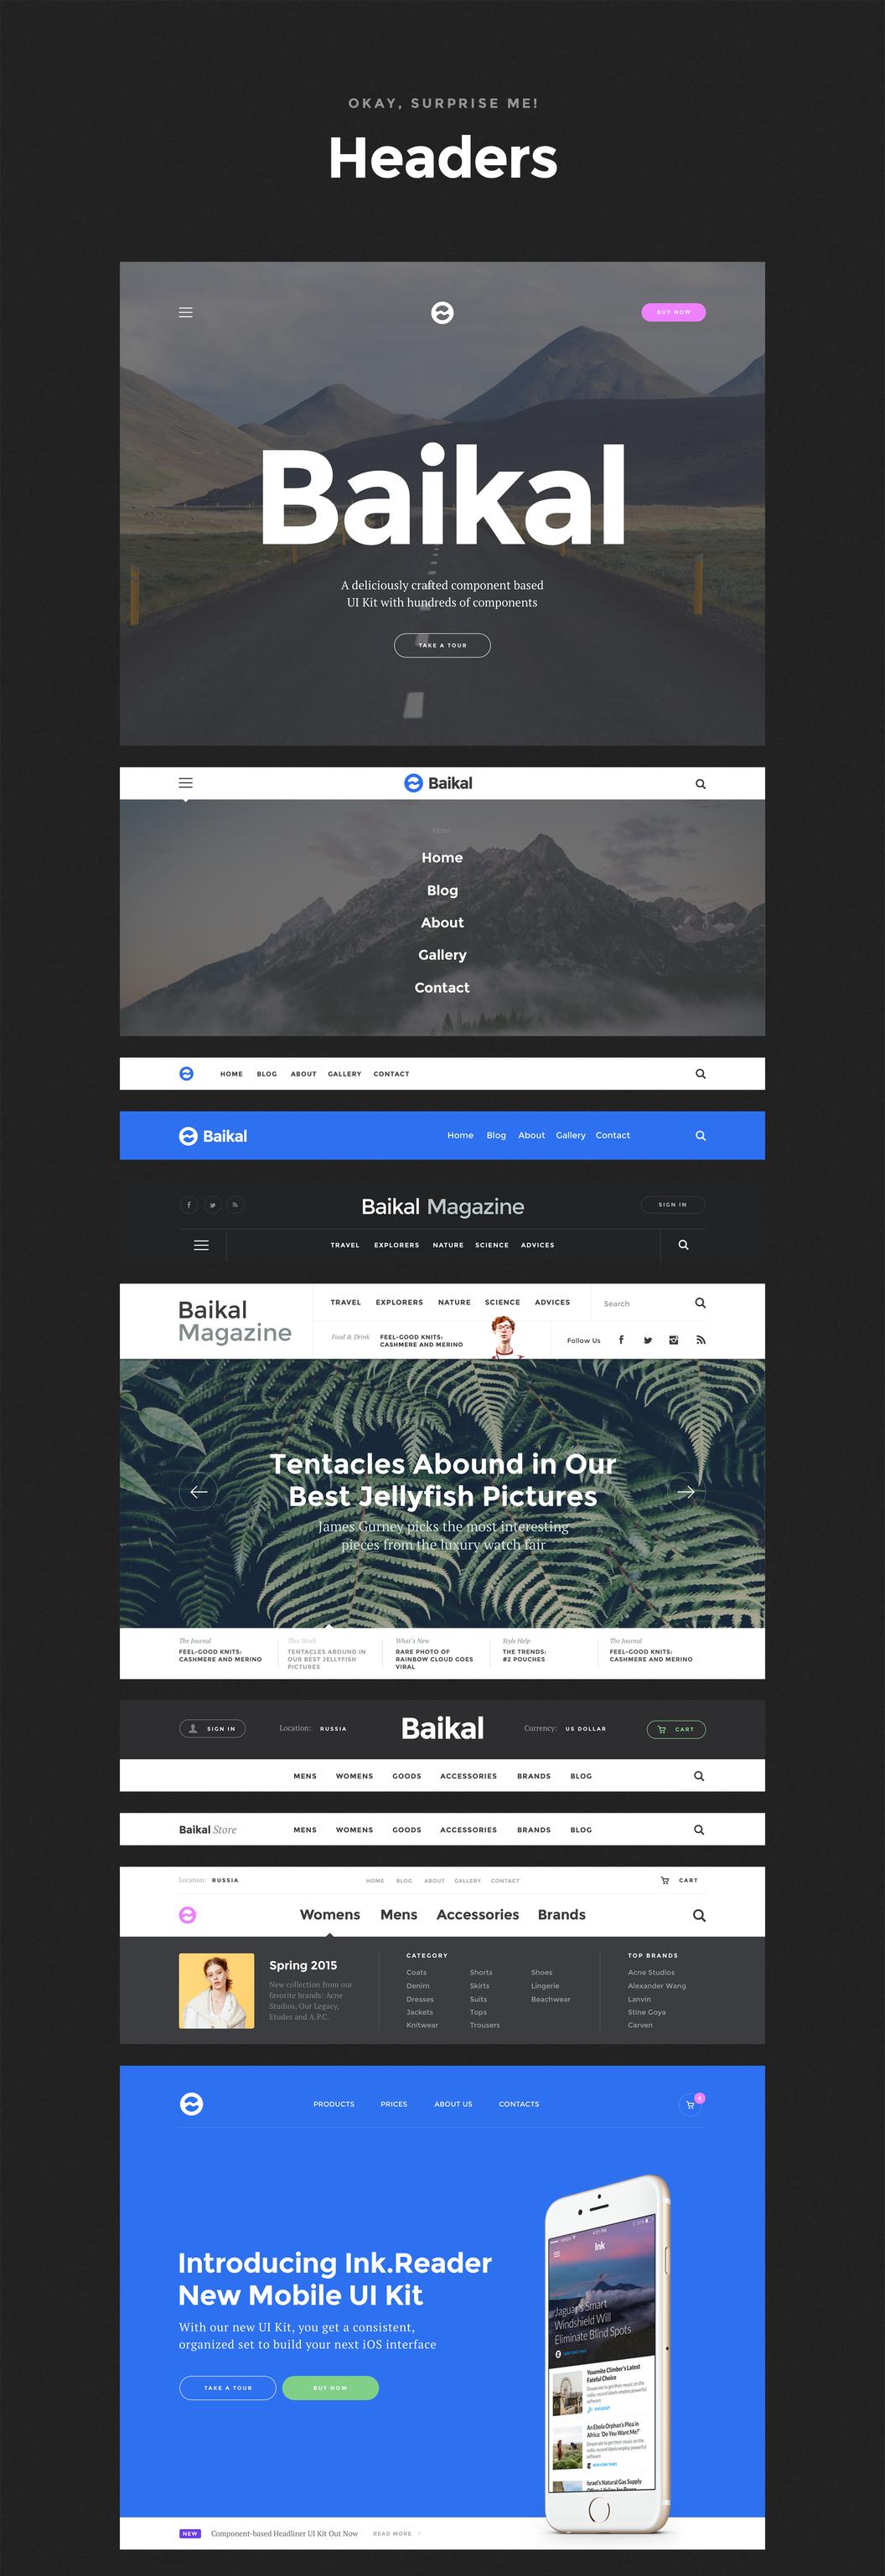 web ui design tools - full_Headers_1421784260529